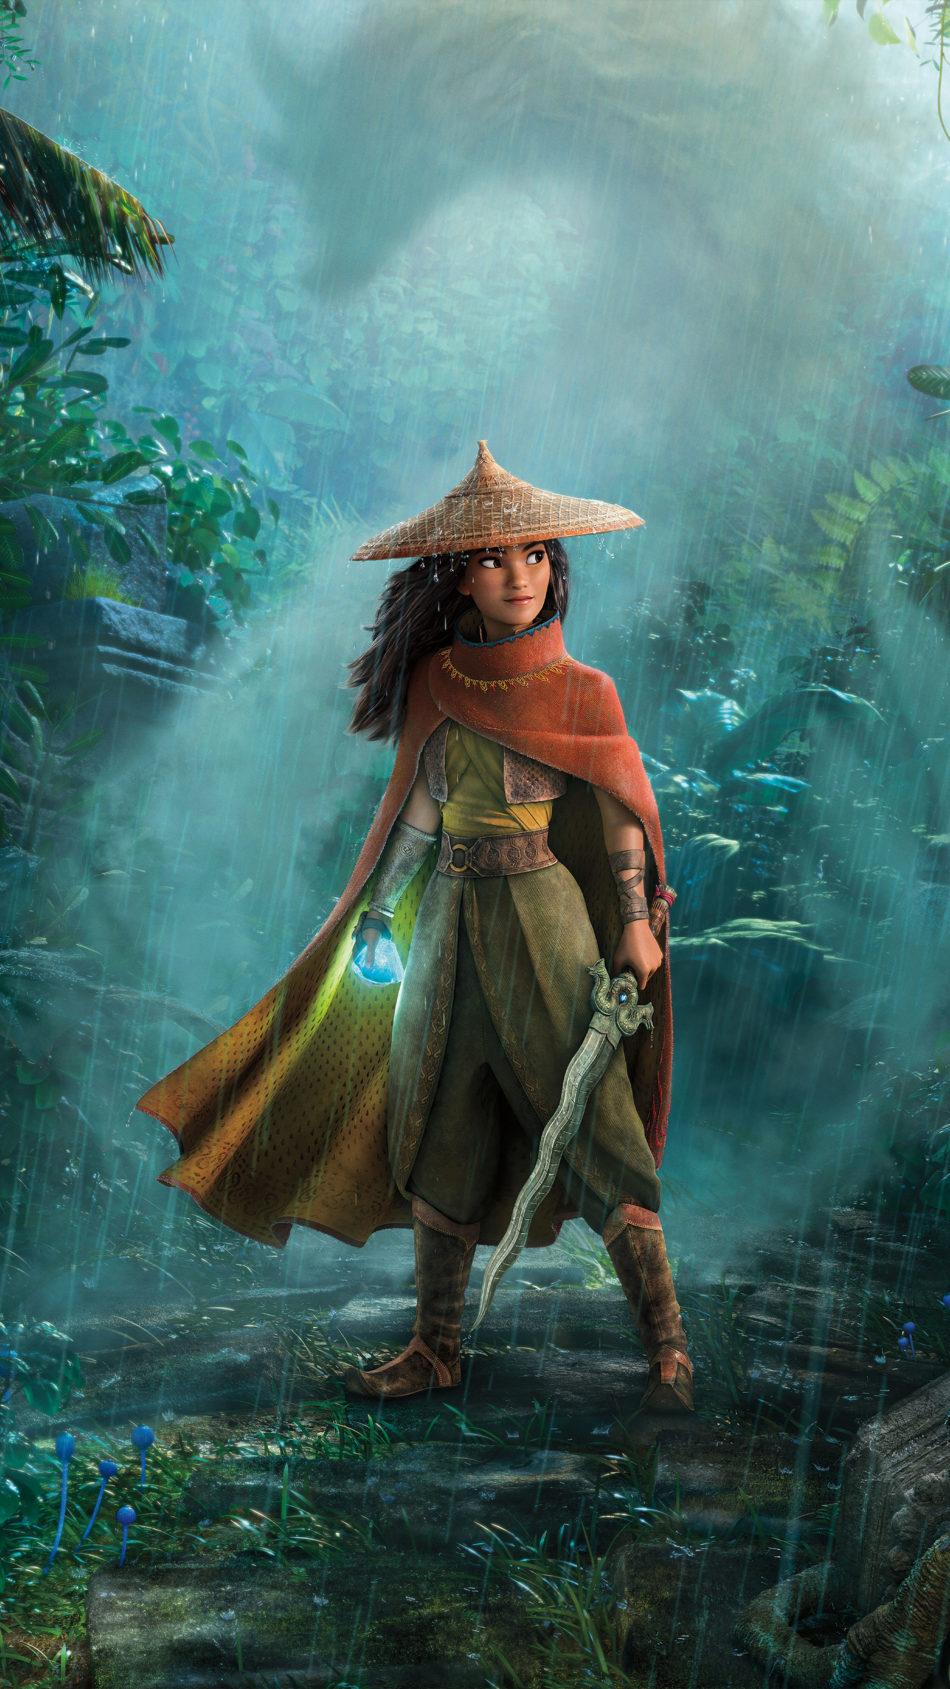 Raya And The Last Dragon 2021 Poster 4K Ultra HD Mobile Wallpaper